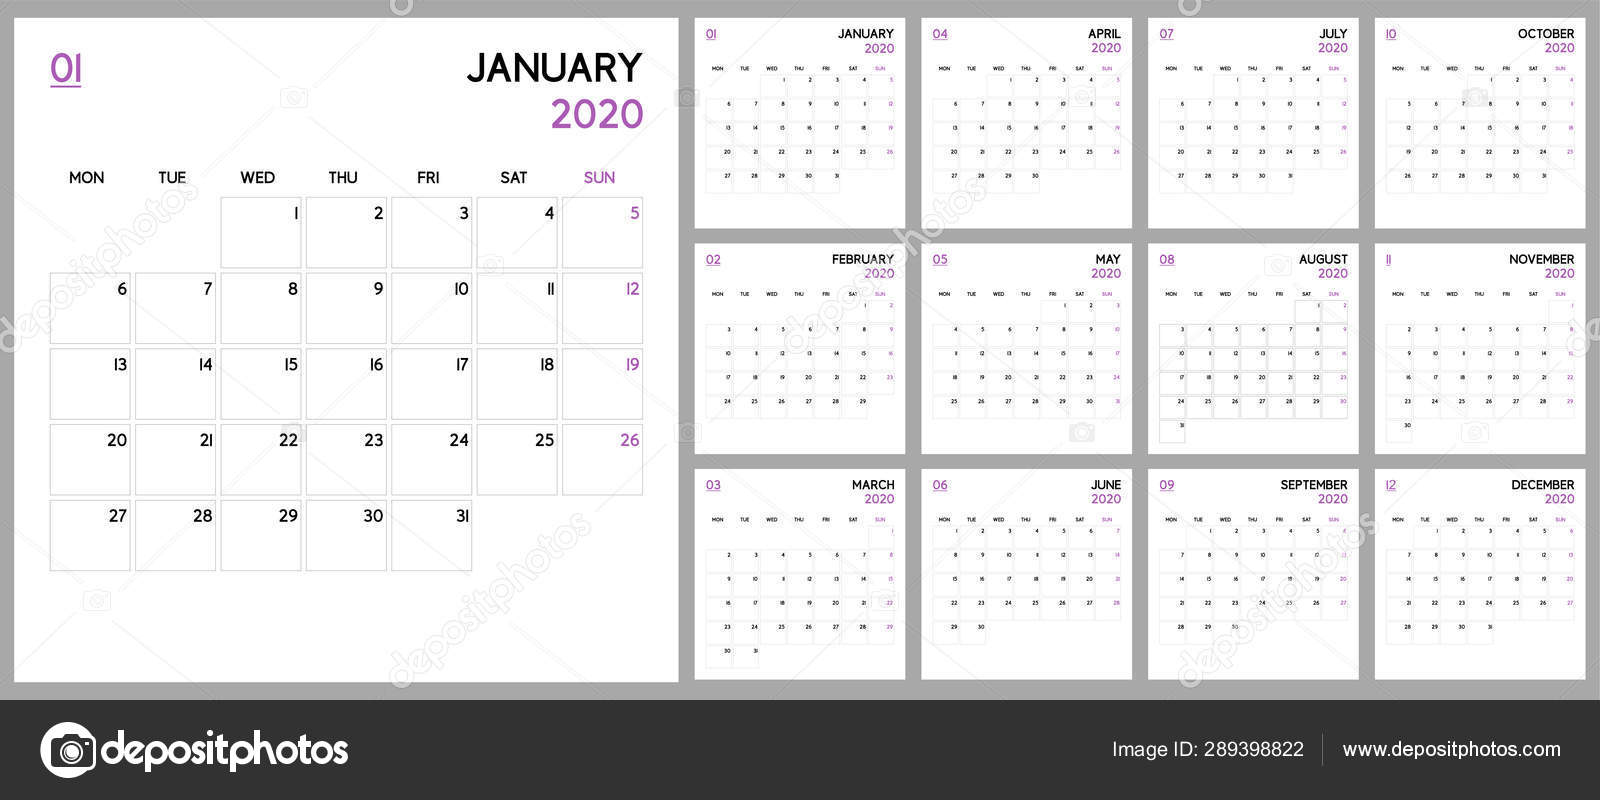 Calendrier 2020 Semaine.Planificateur Calendrier 2020 Conception Modele Base Semaine